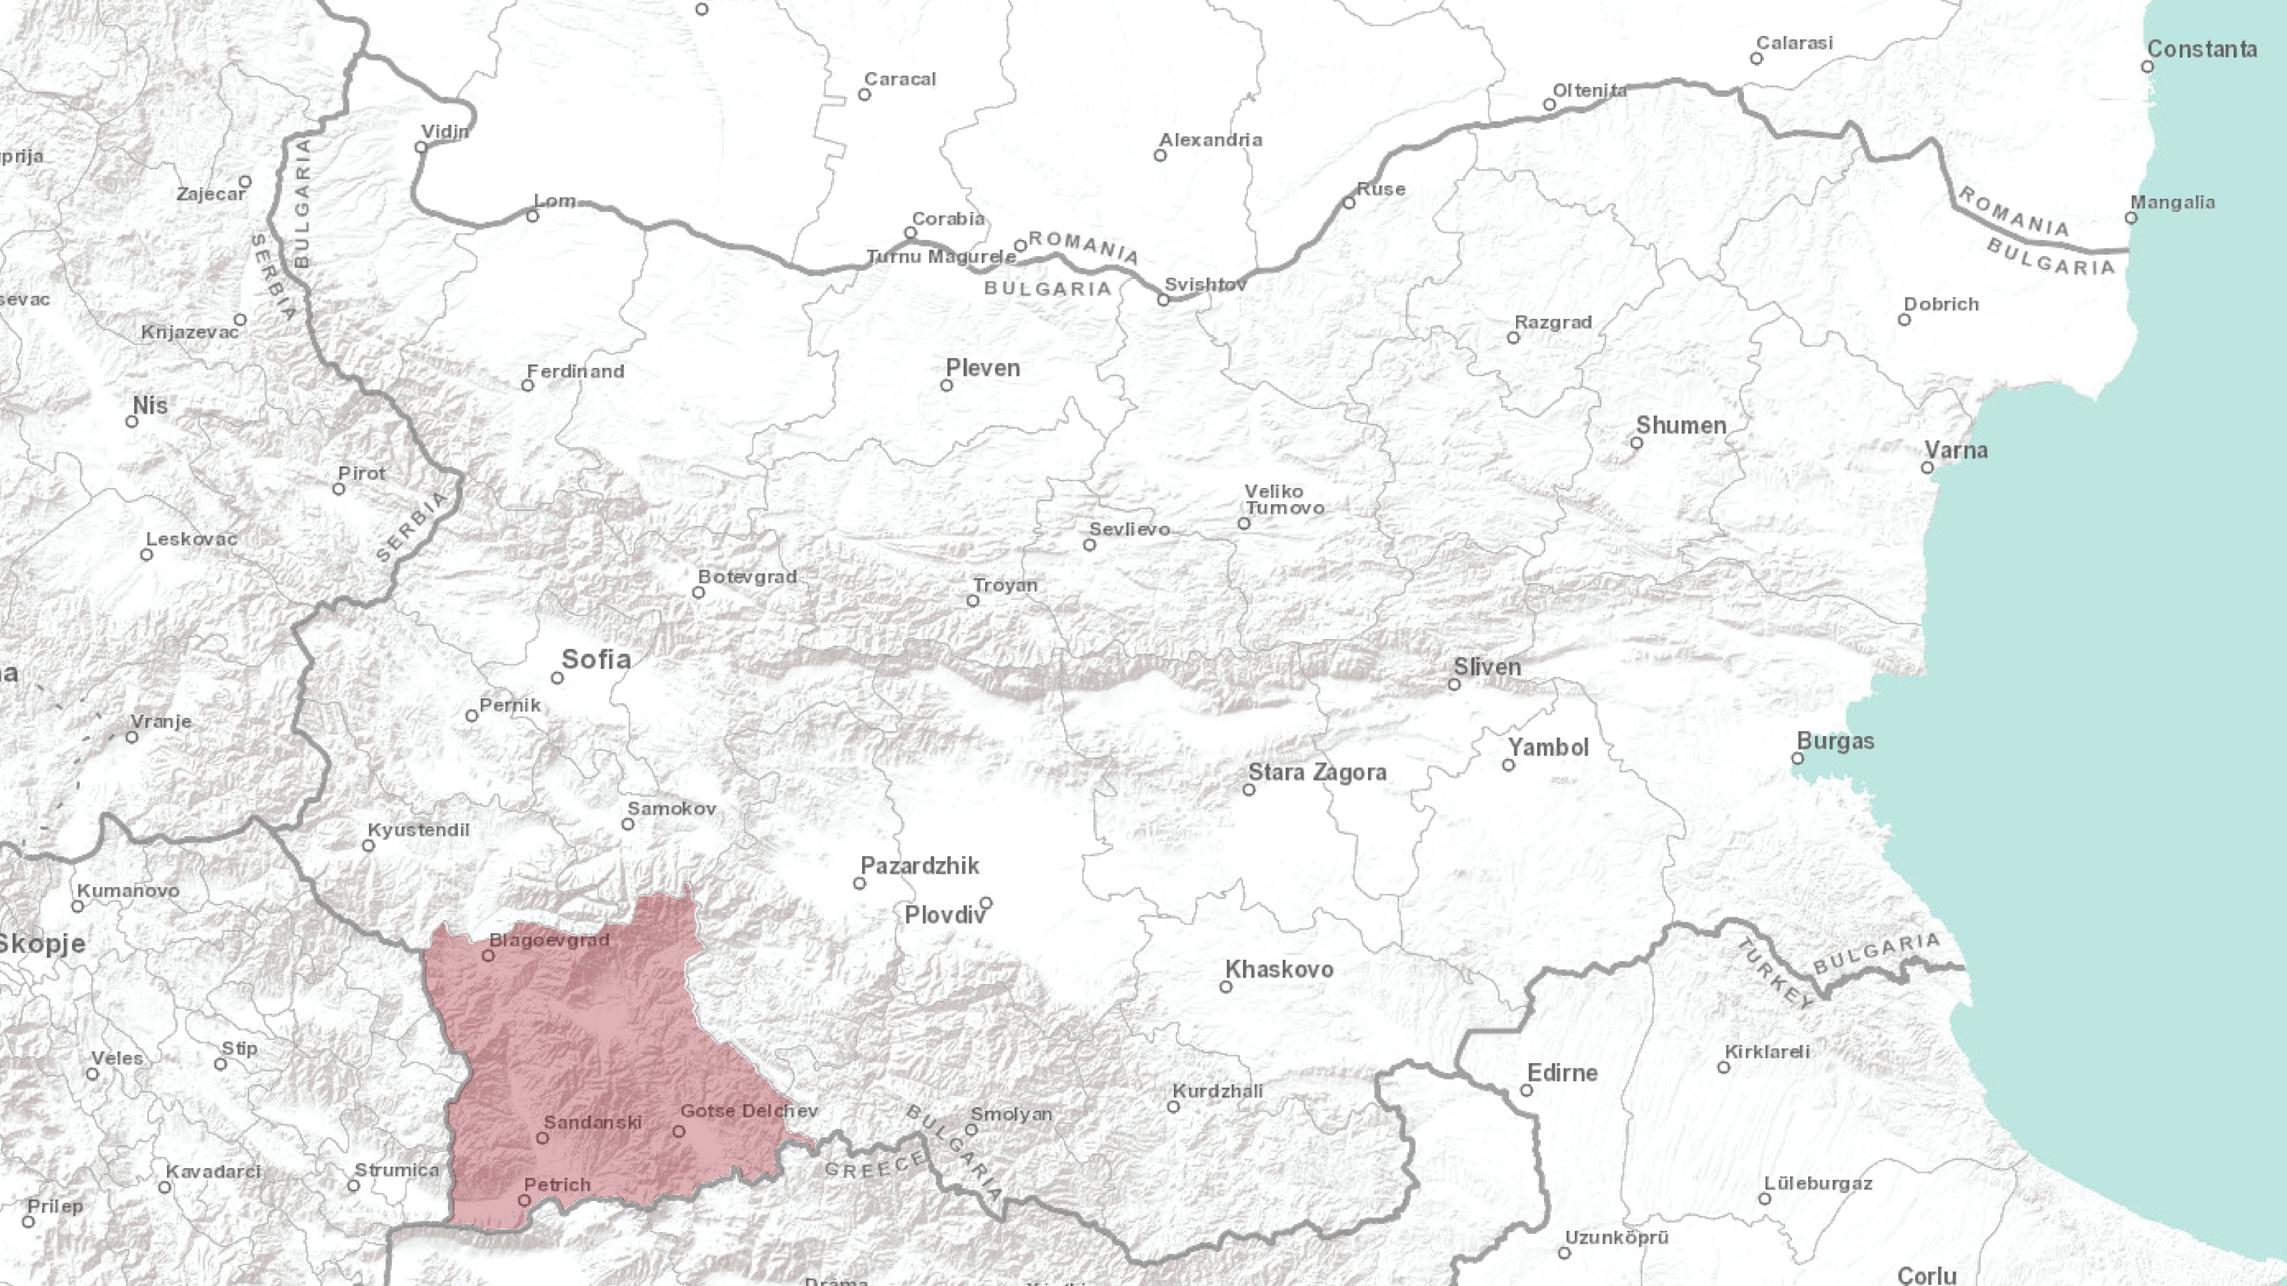 Blagoevgrad Province